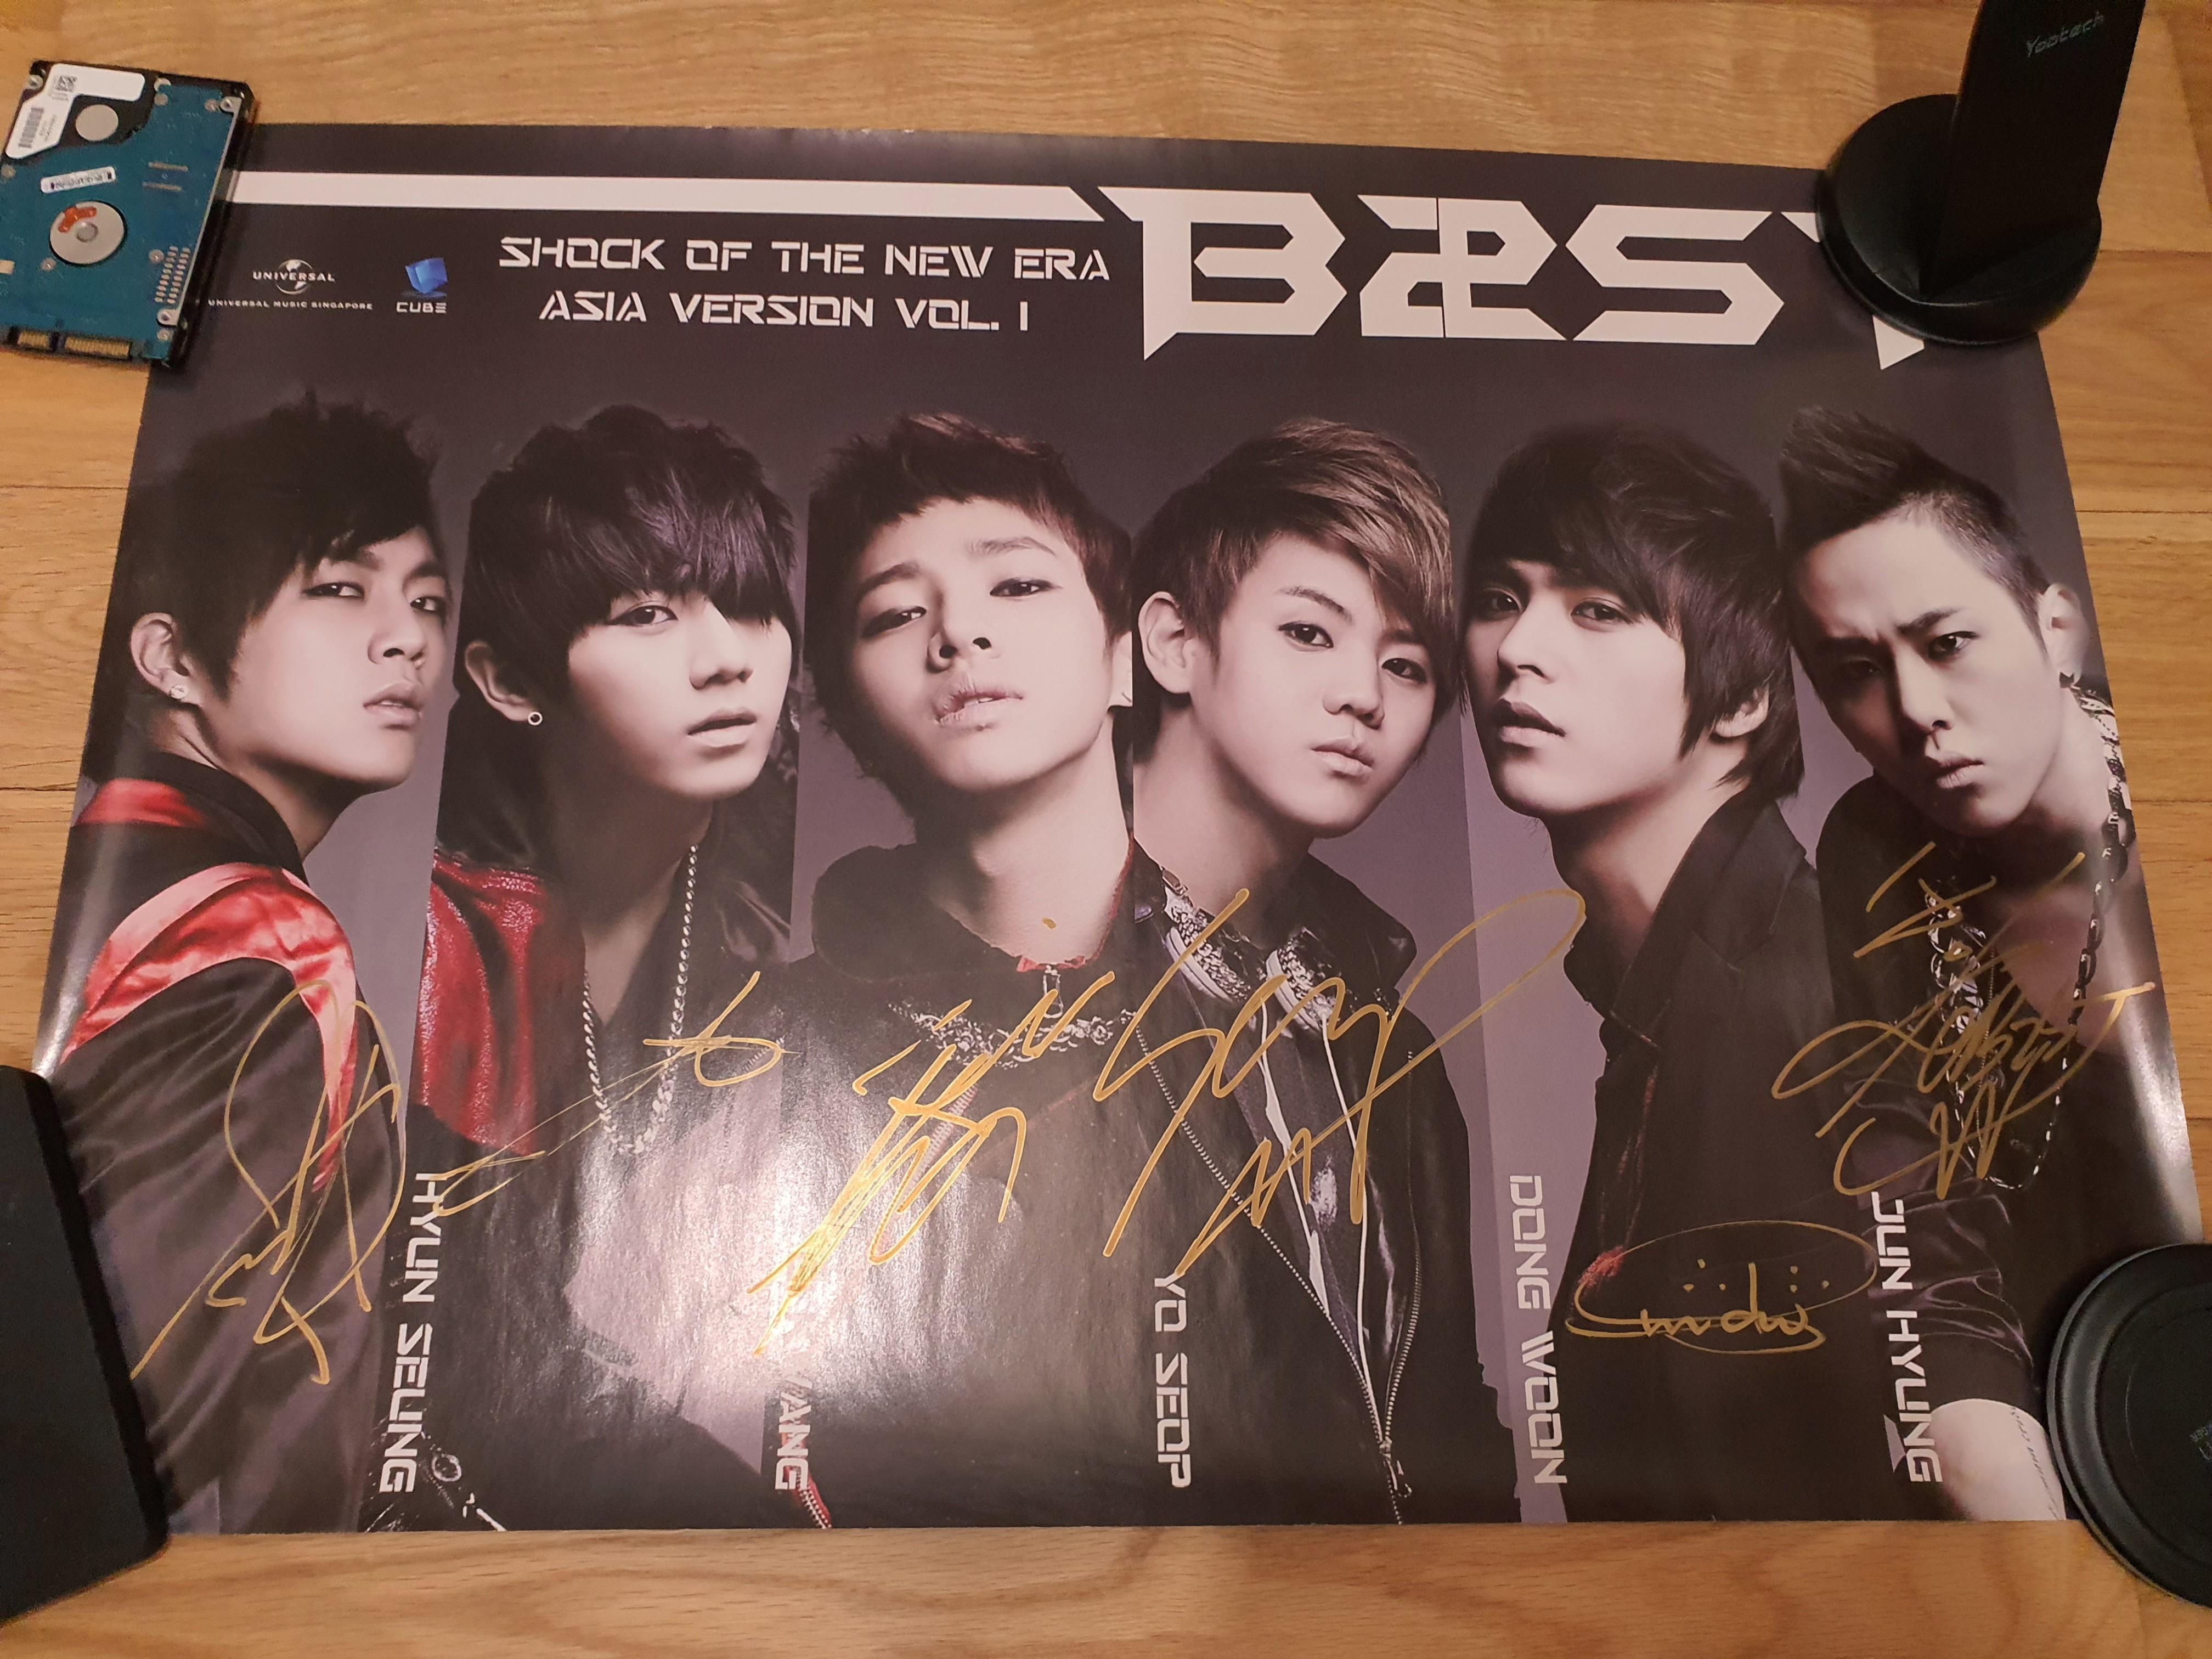 CLEARANCE] Kpop posters EXO, B21ST BEAST, SM TOWN DBSK TVXQ SUPER ...